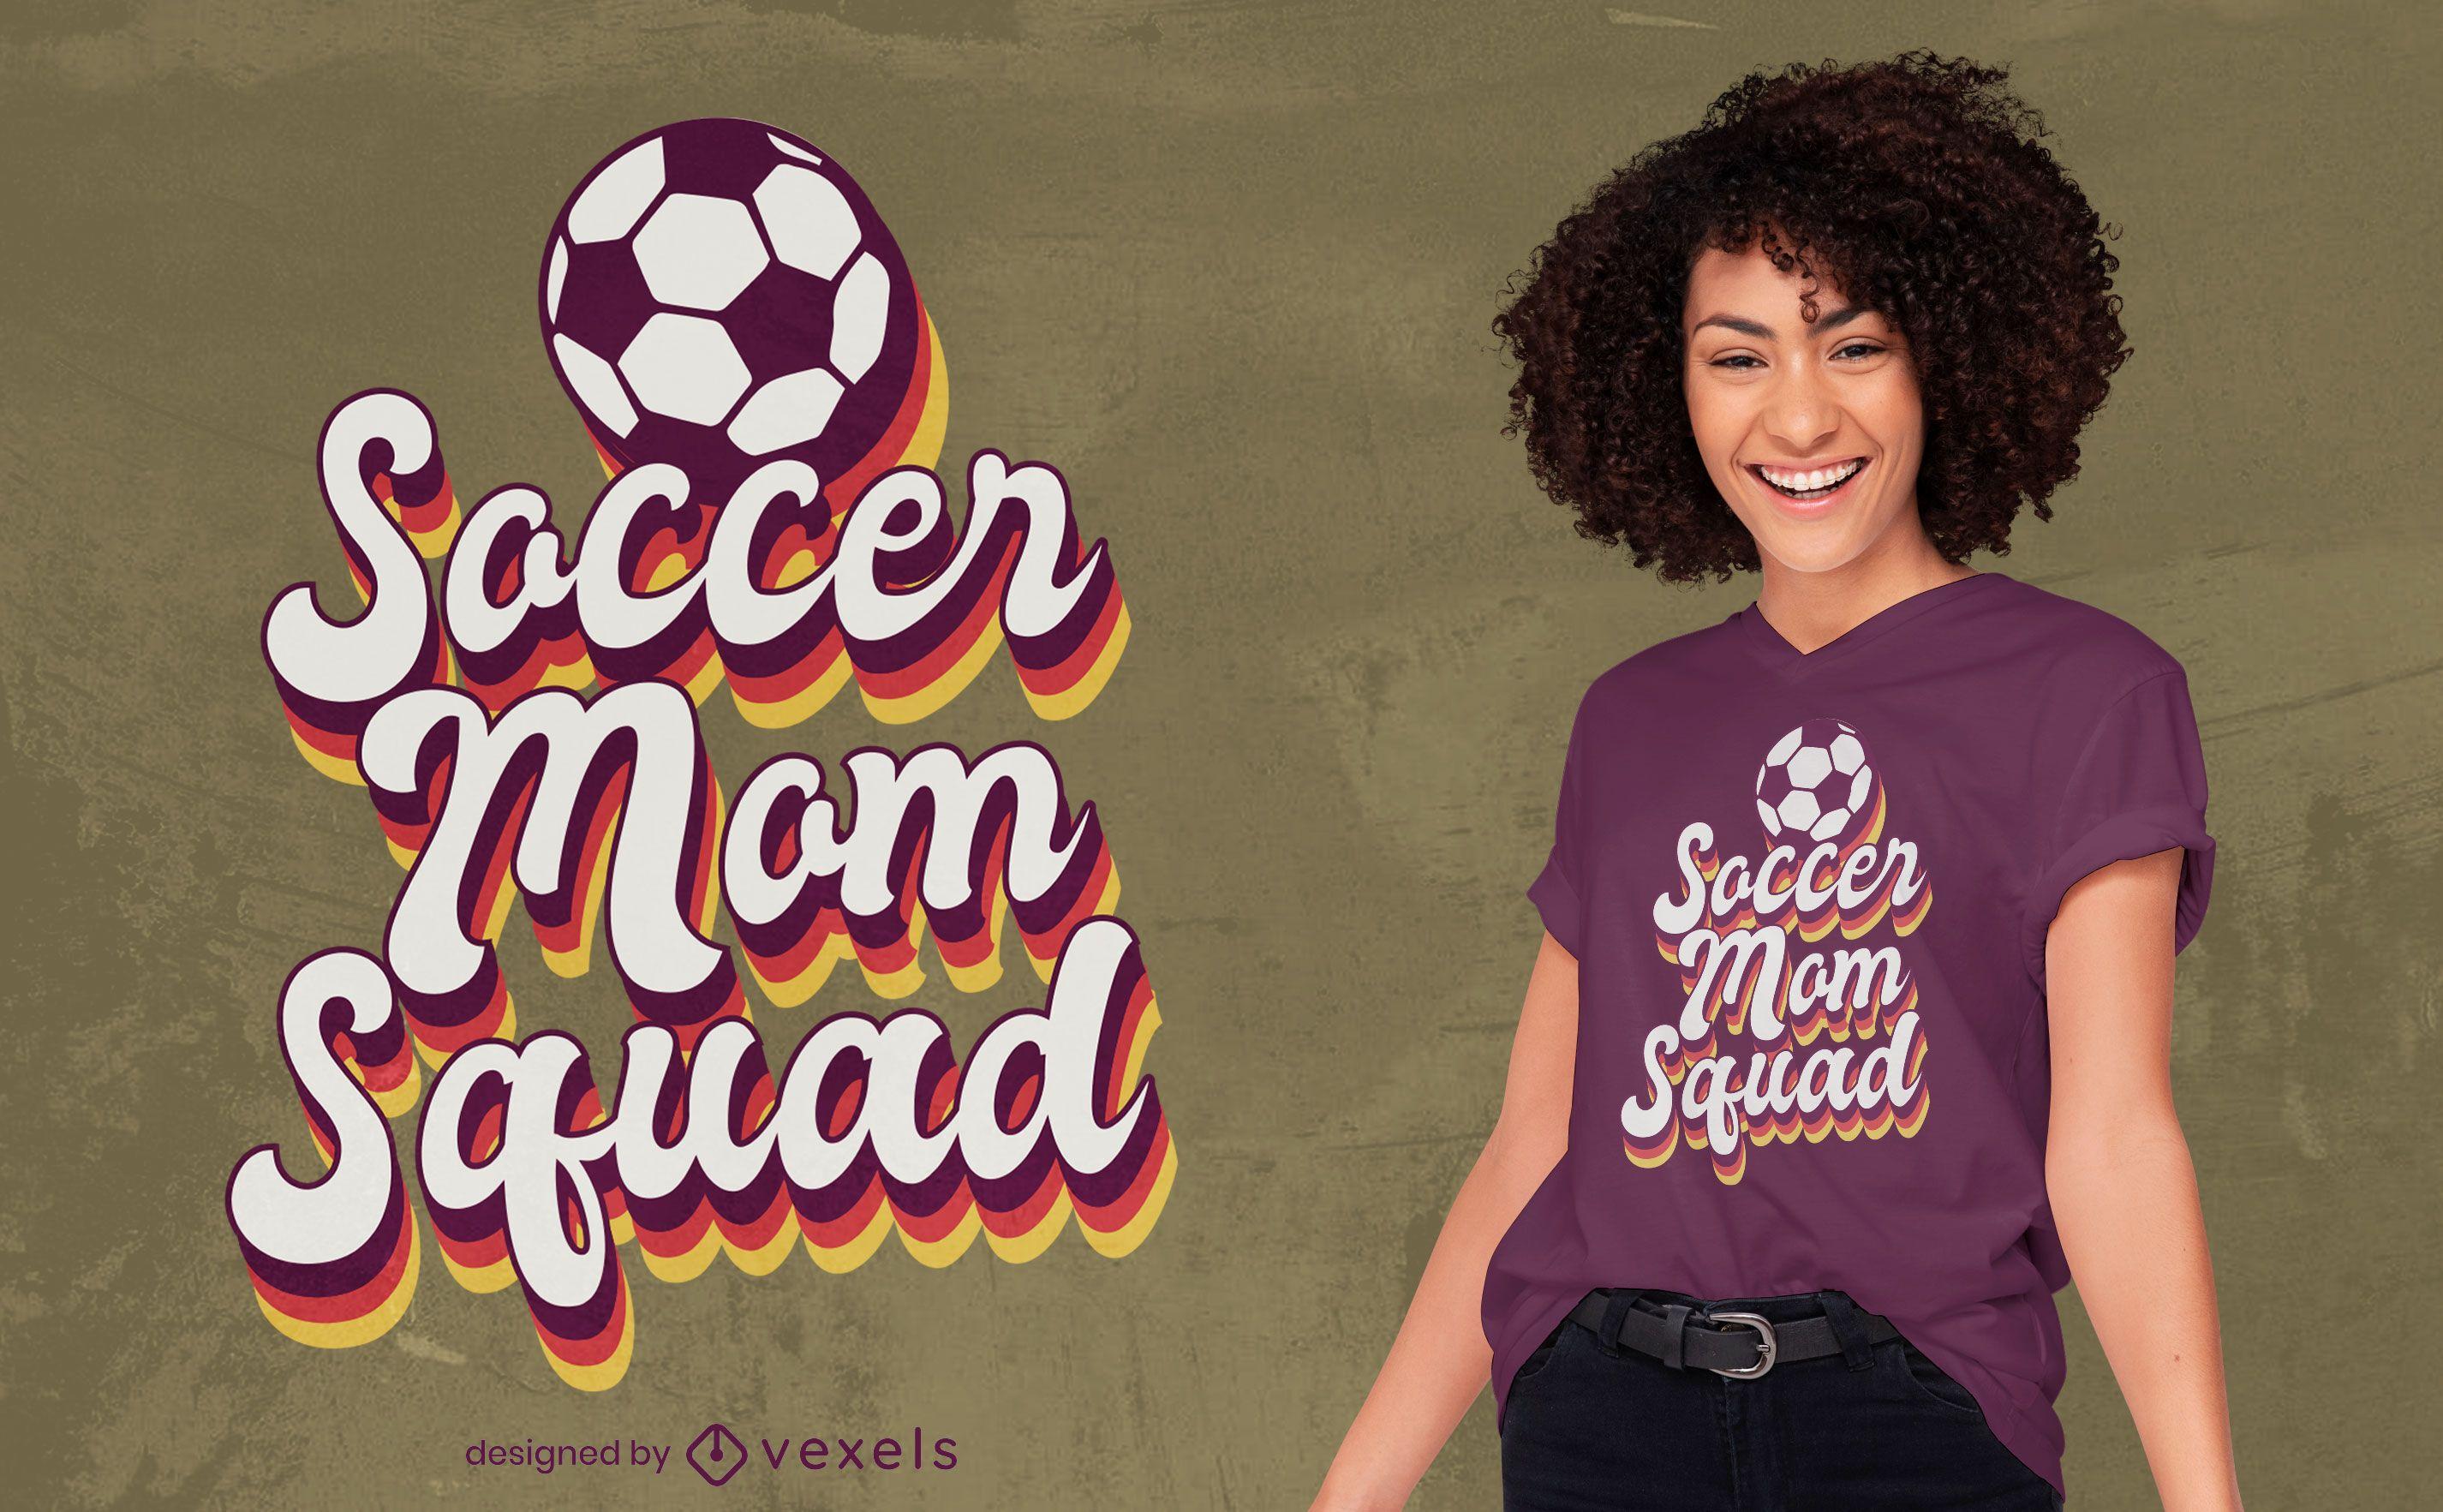 Soccer mom squad t-shirt design